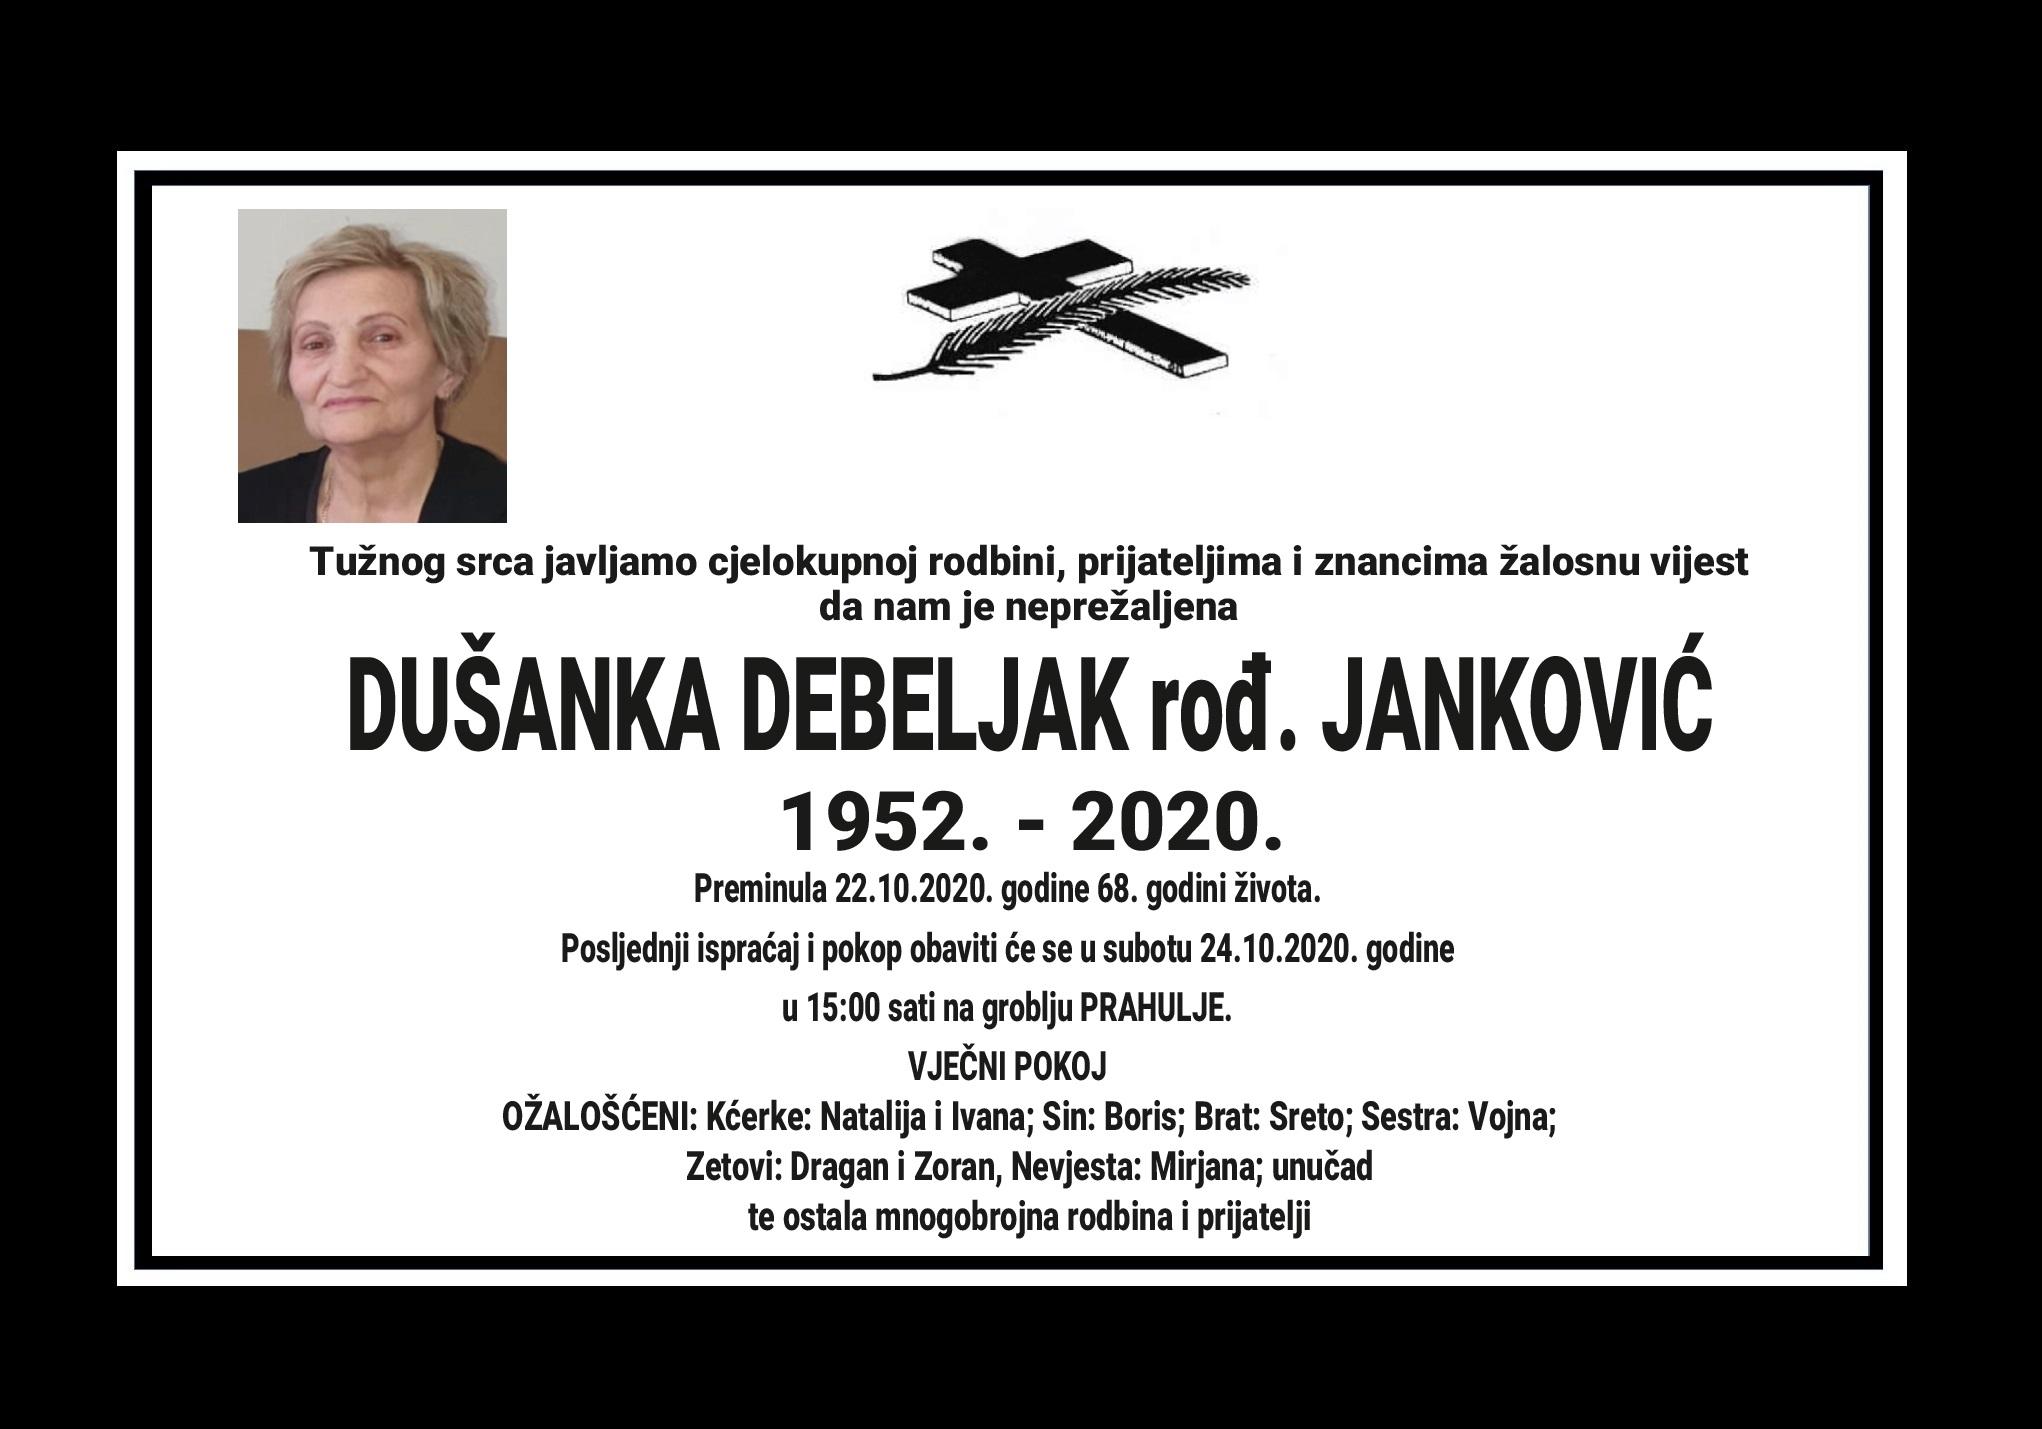 Dušanka Debeljak rođ. Janković